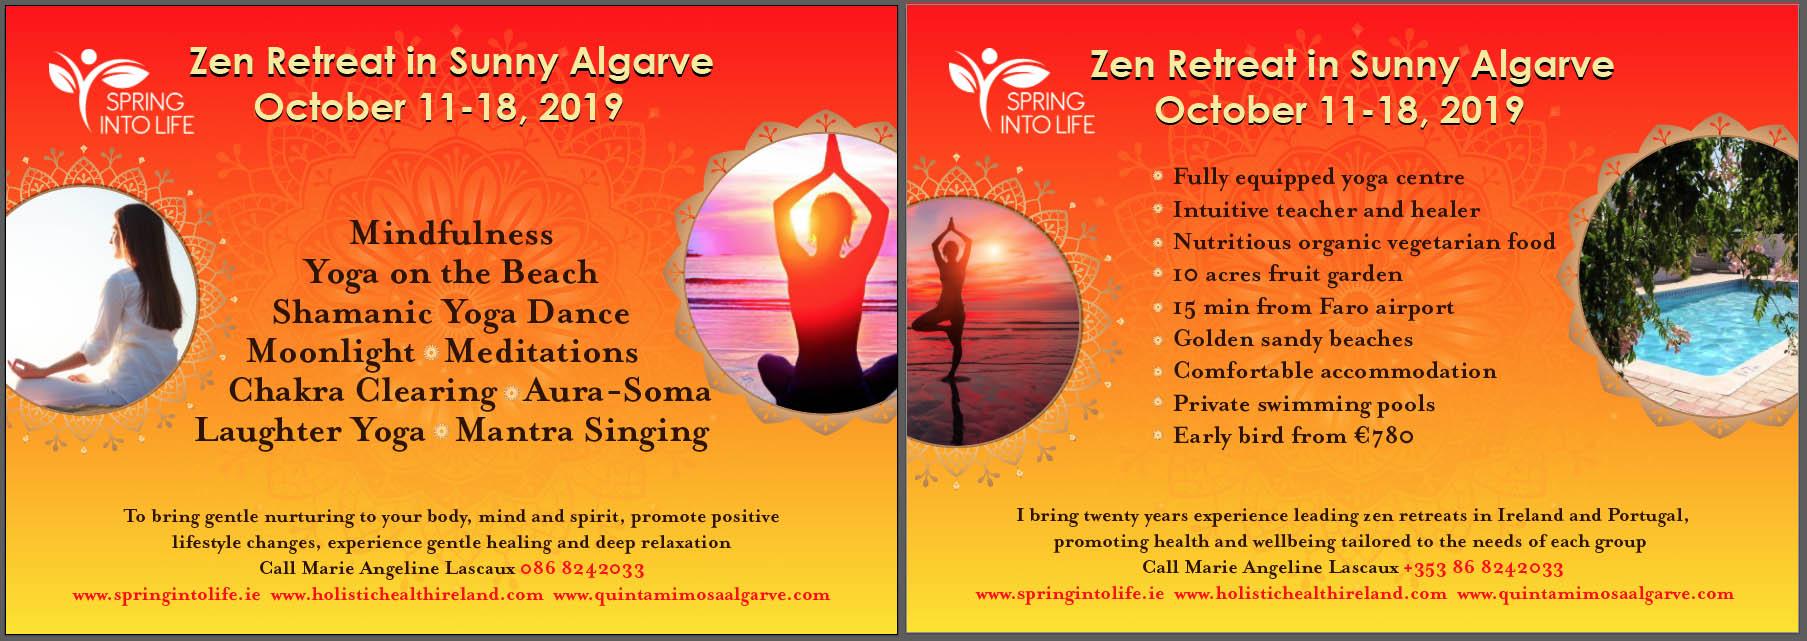 zen retreat yoga holiday ireland